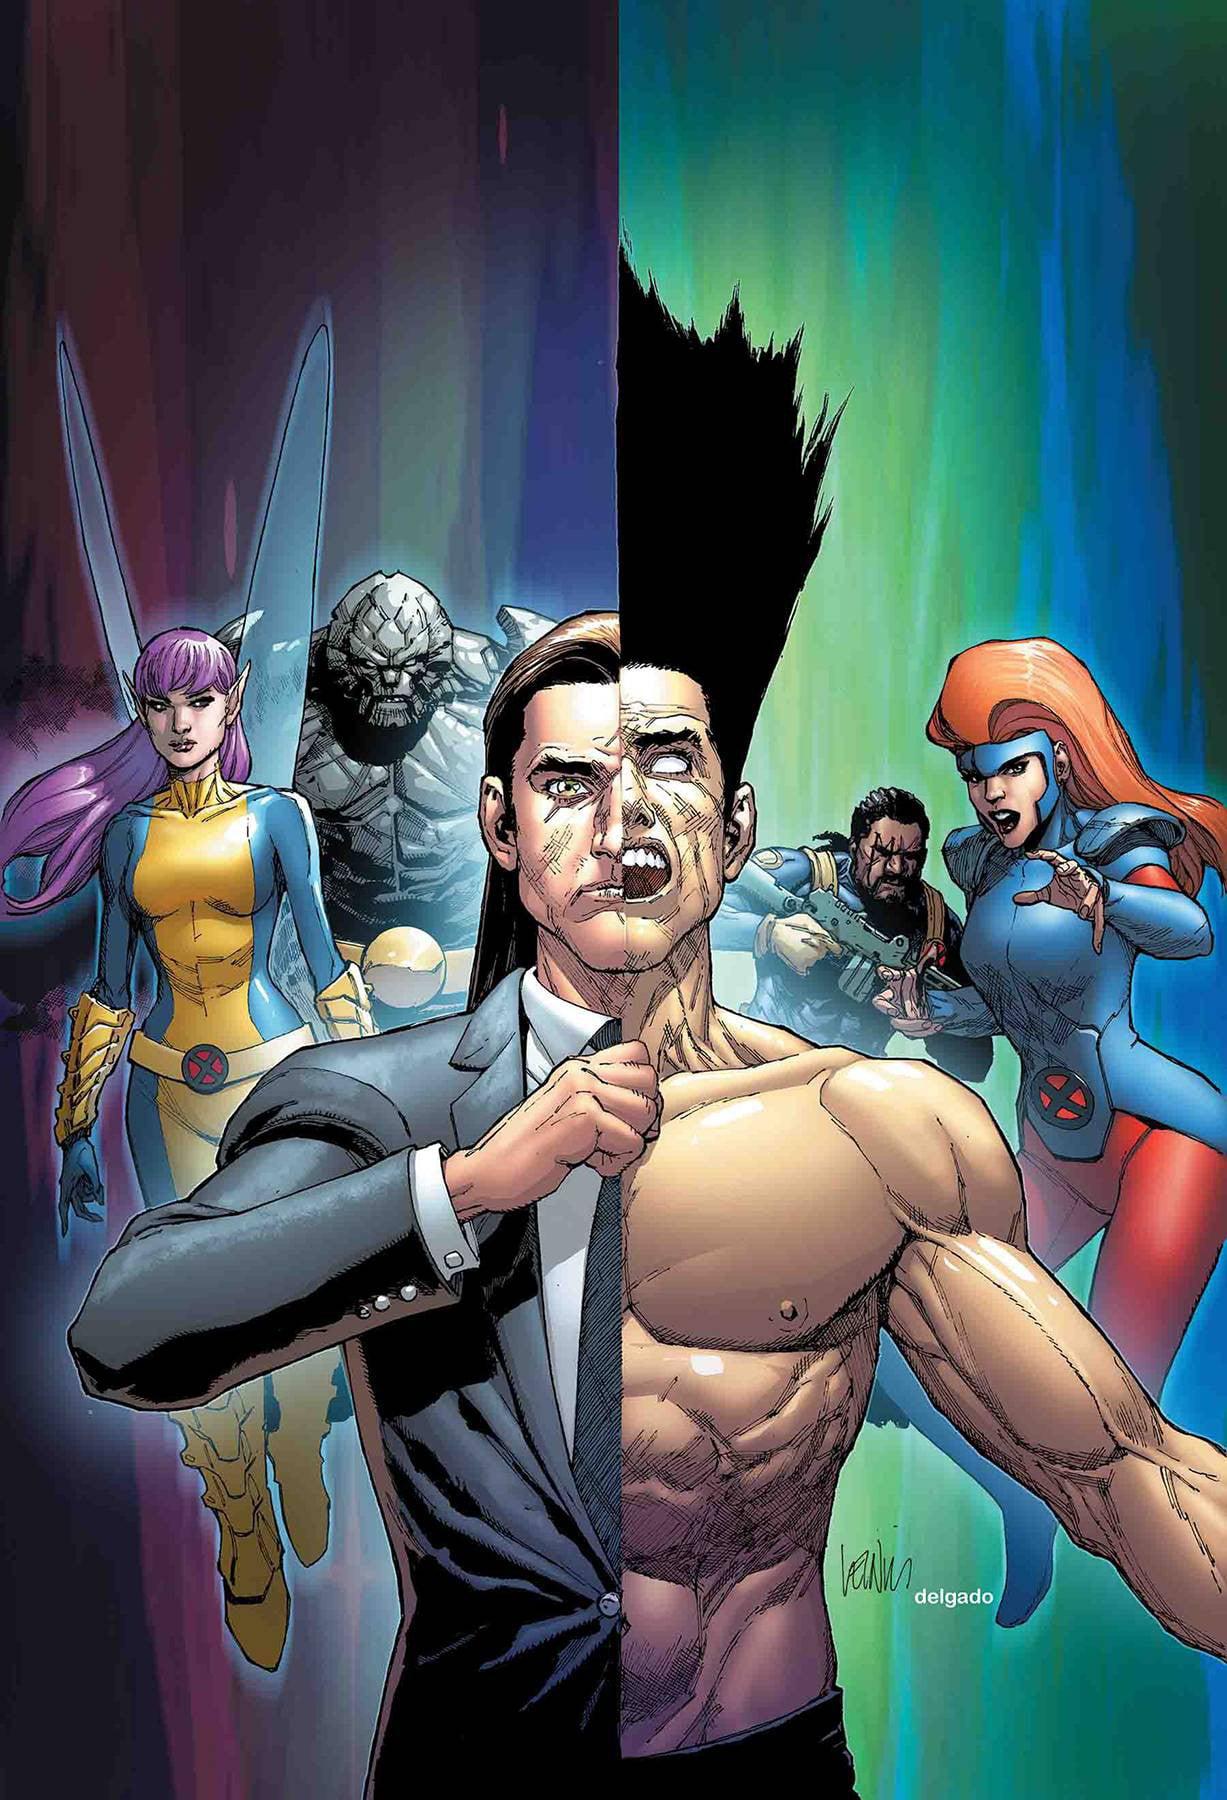 Marvel Uncanny X-Men #3 by